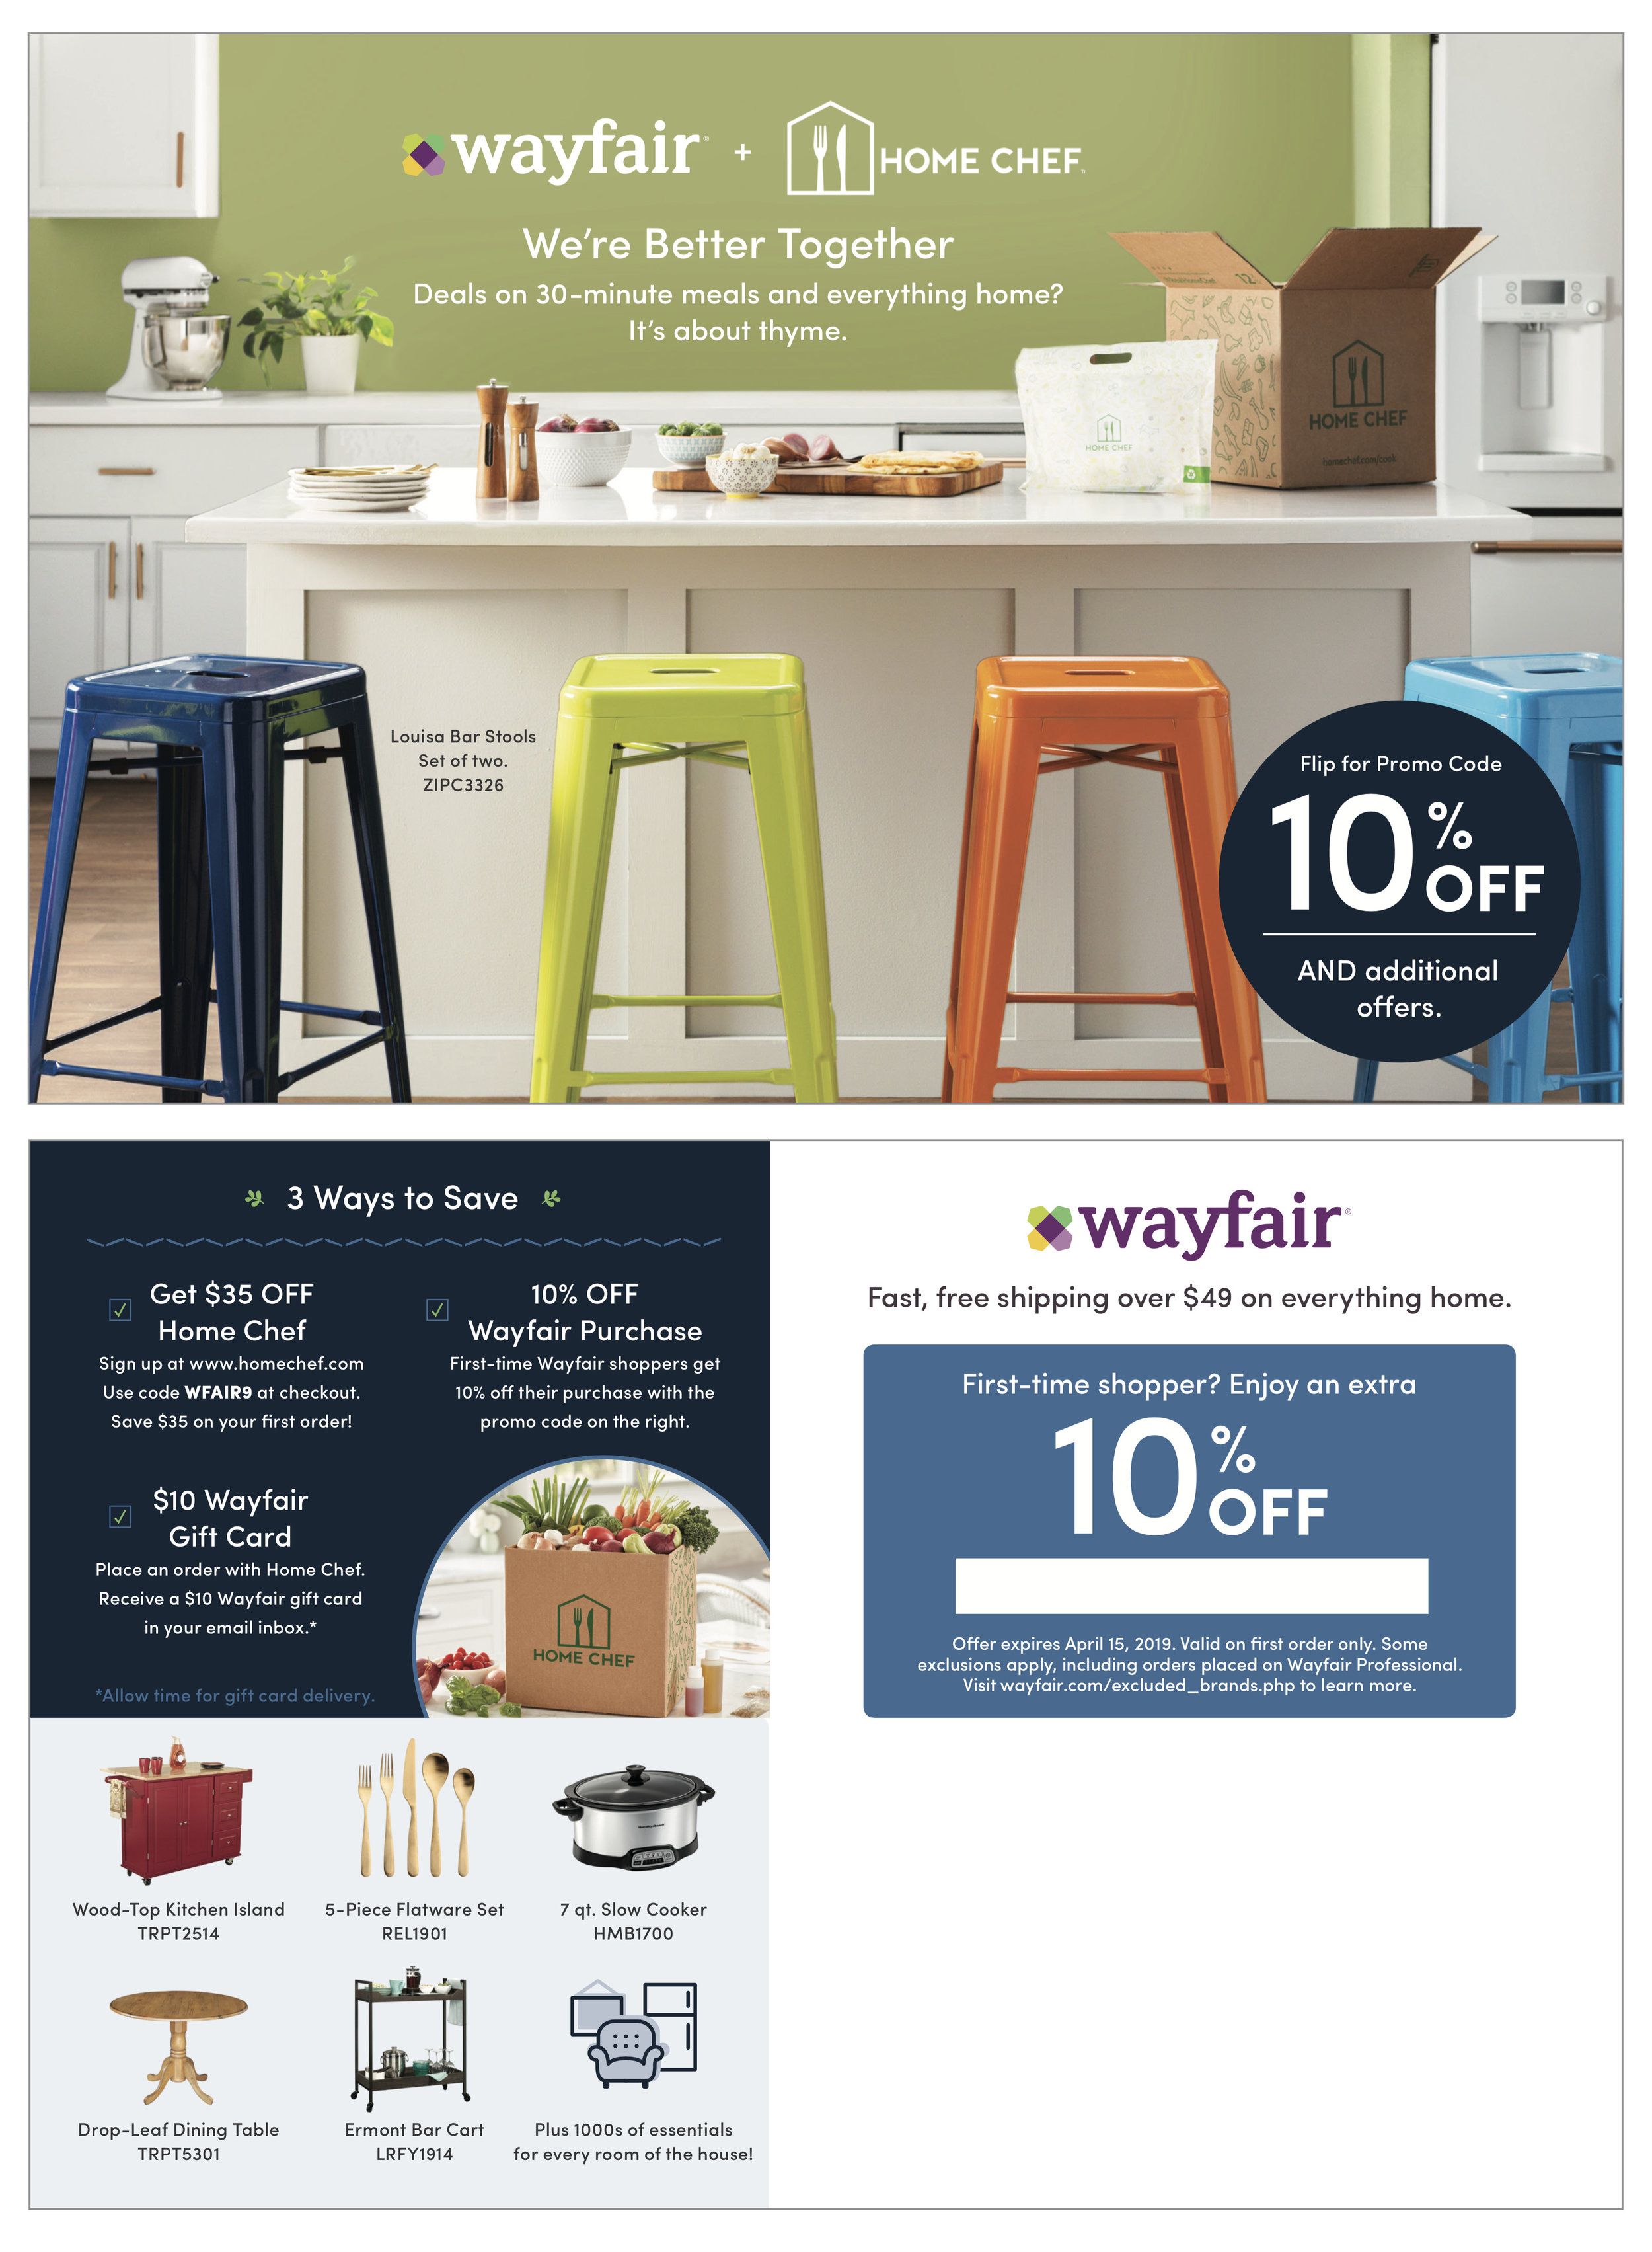 Wayfair x Home Chef Collaboration Mailer